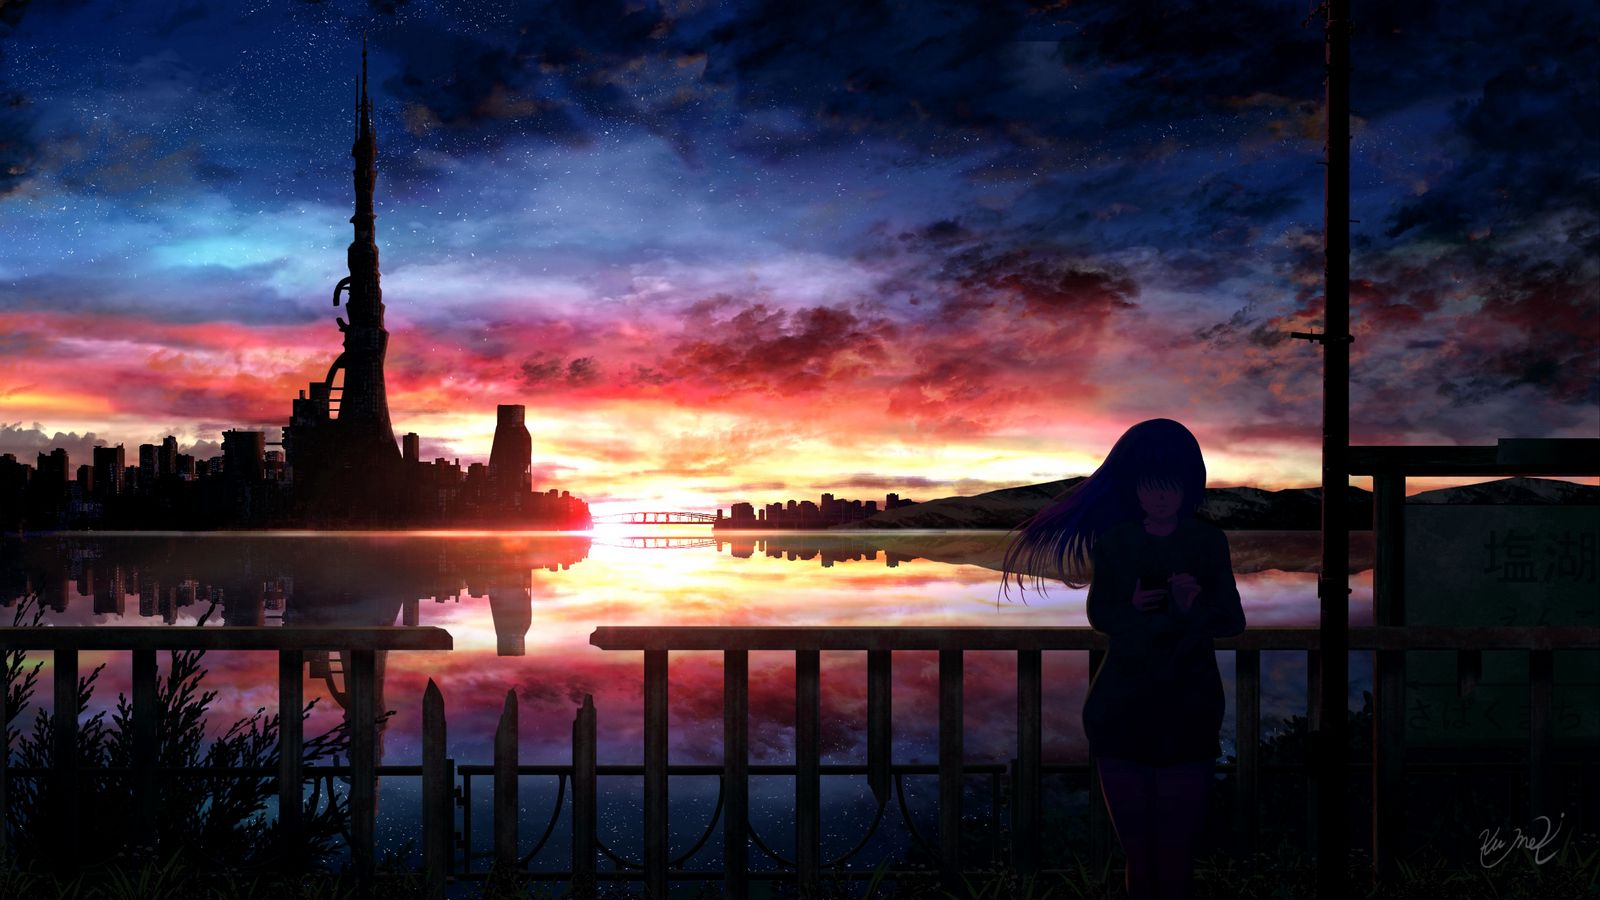 1600x900 Wallpaper silhouette, night, starry sky, girl, anime